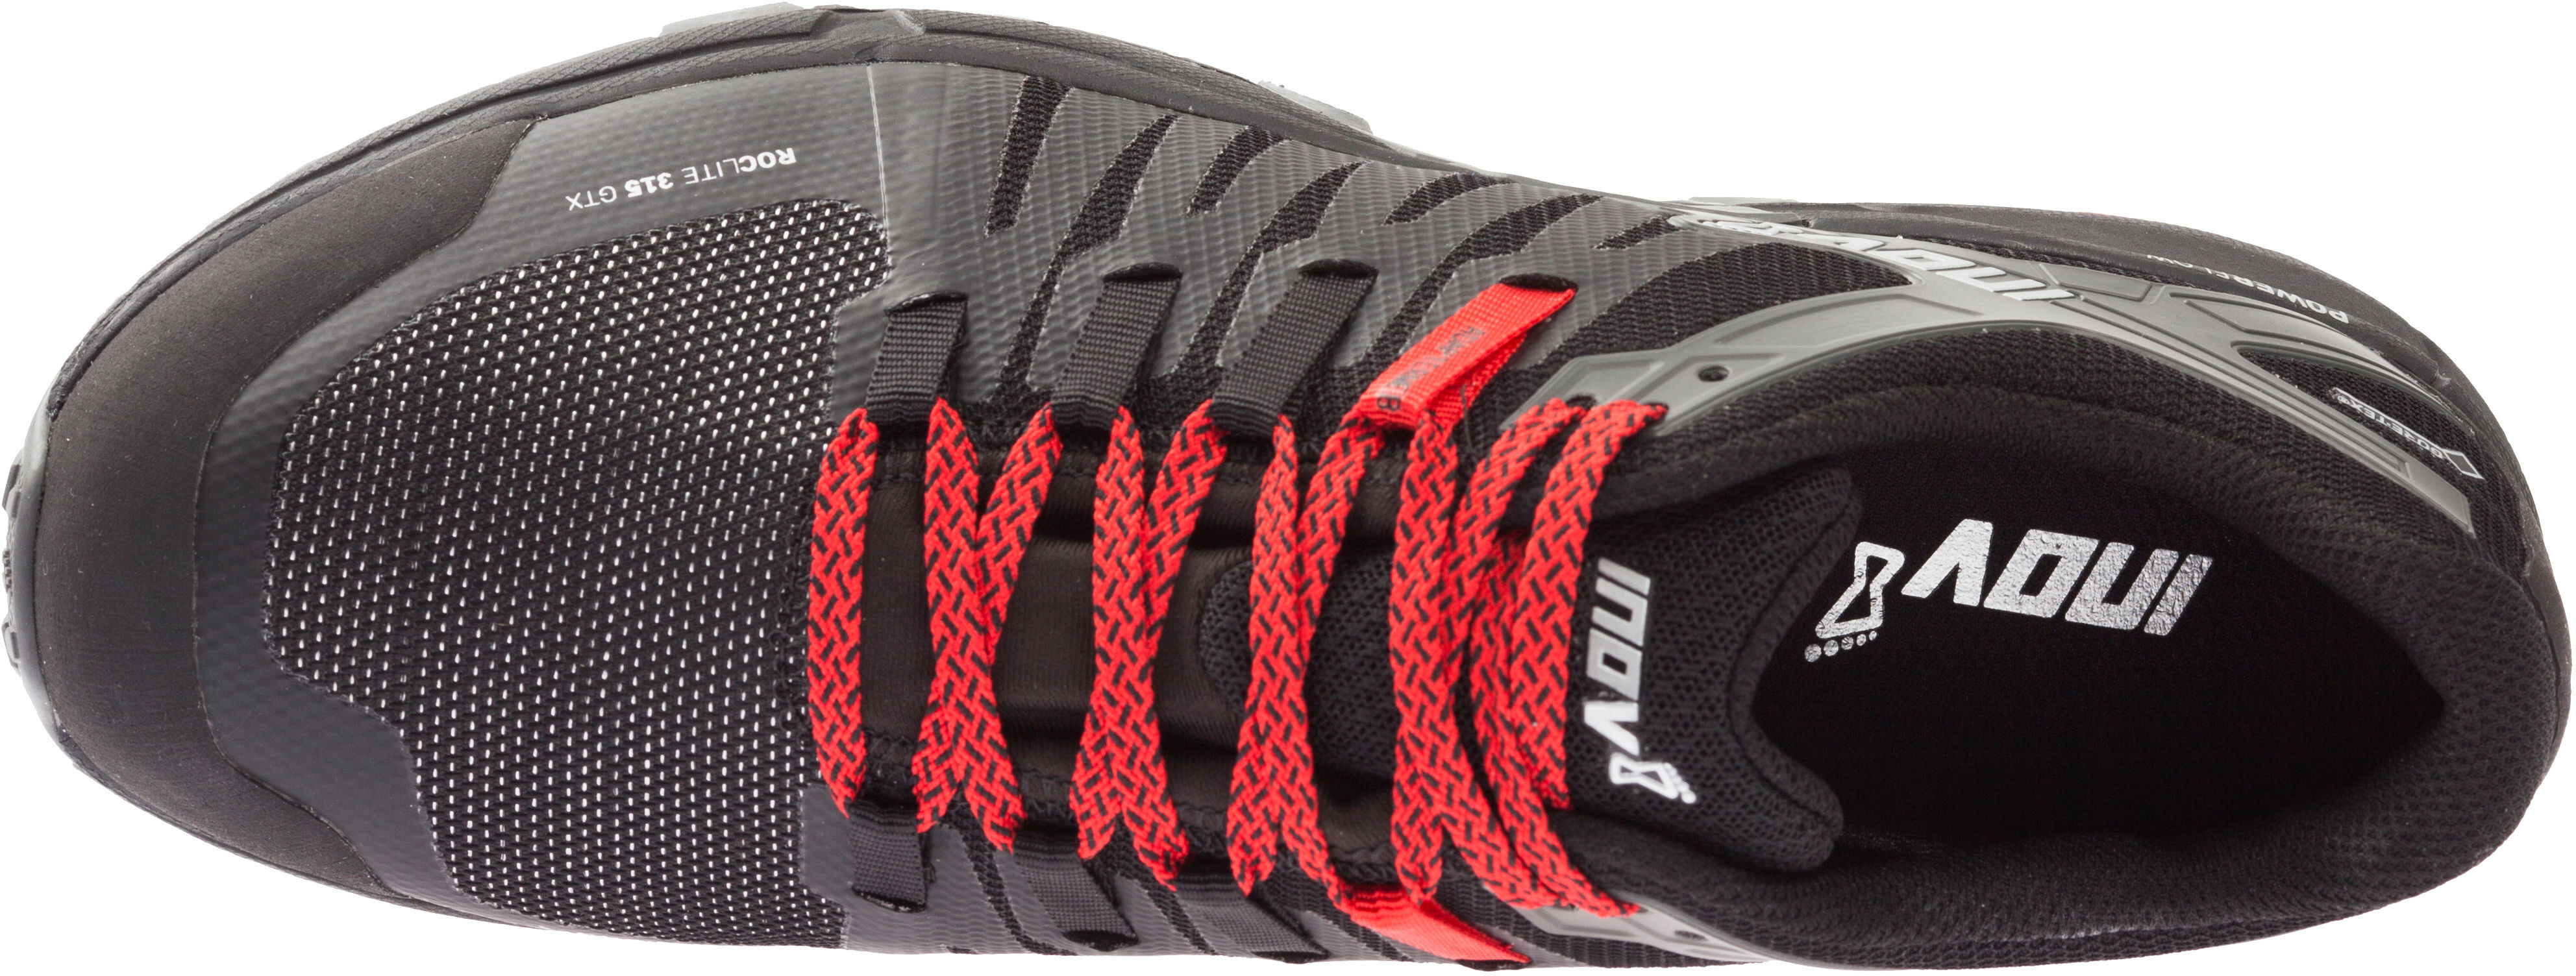 inov-8 Roclite 315 GTX - Chaussures running Homme - noir - Boutique ... 5af9559a5135